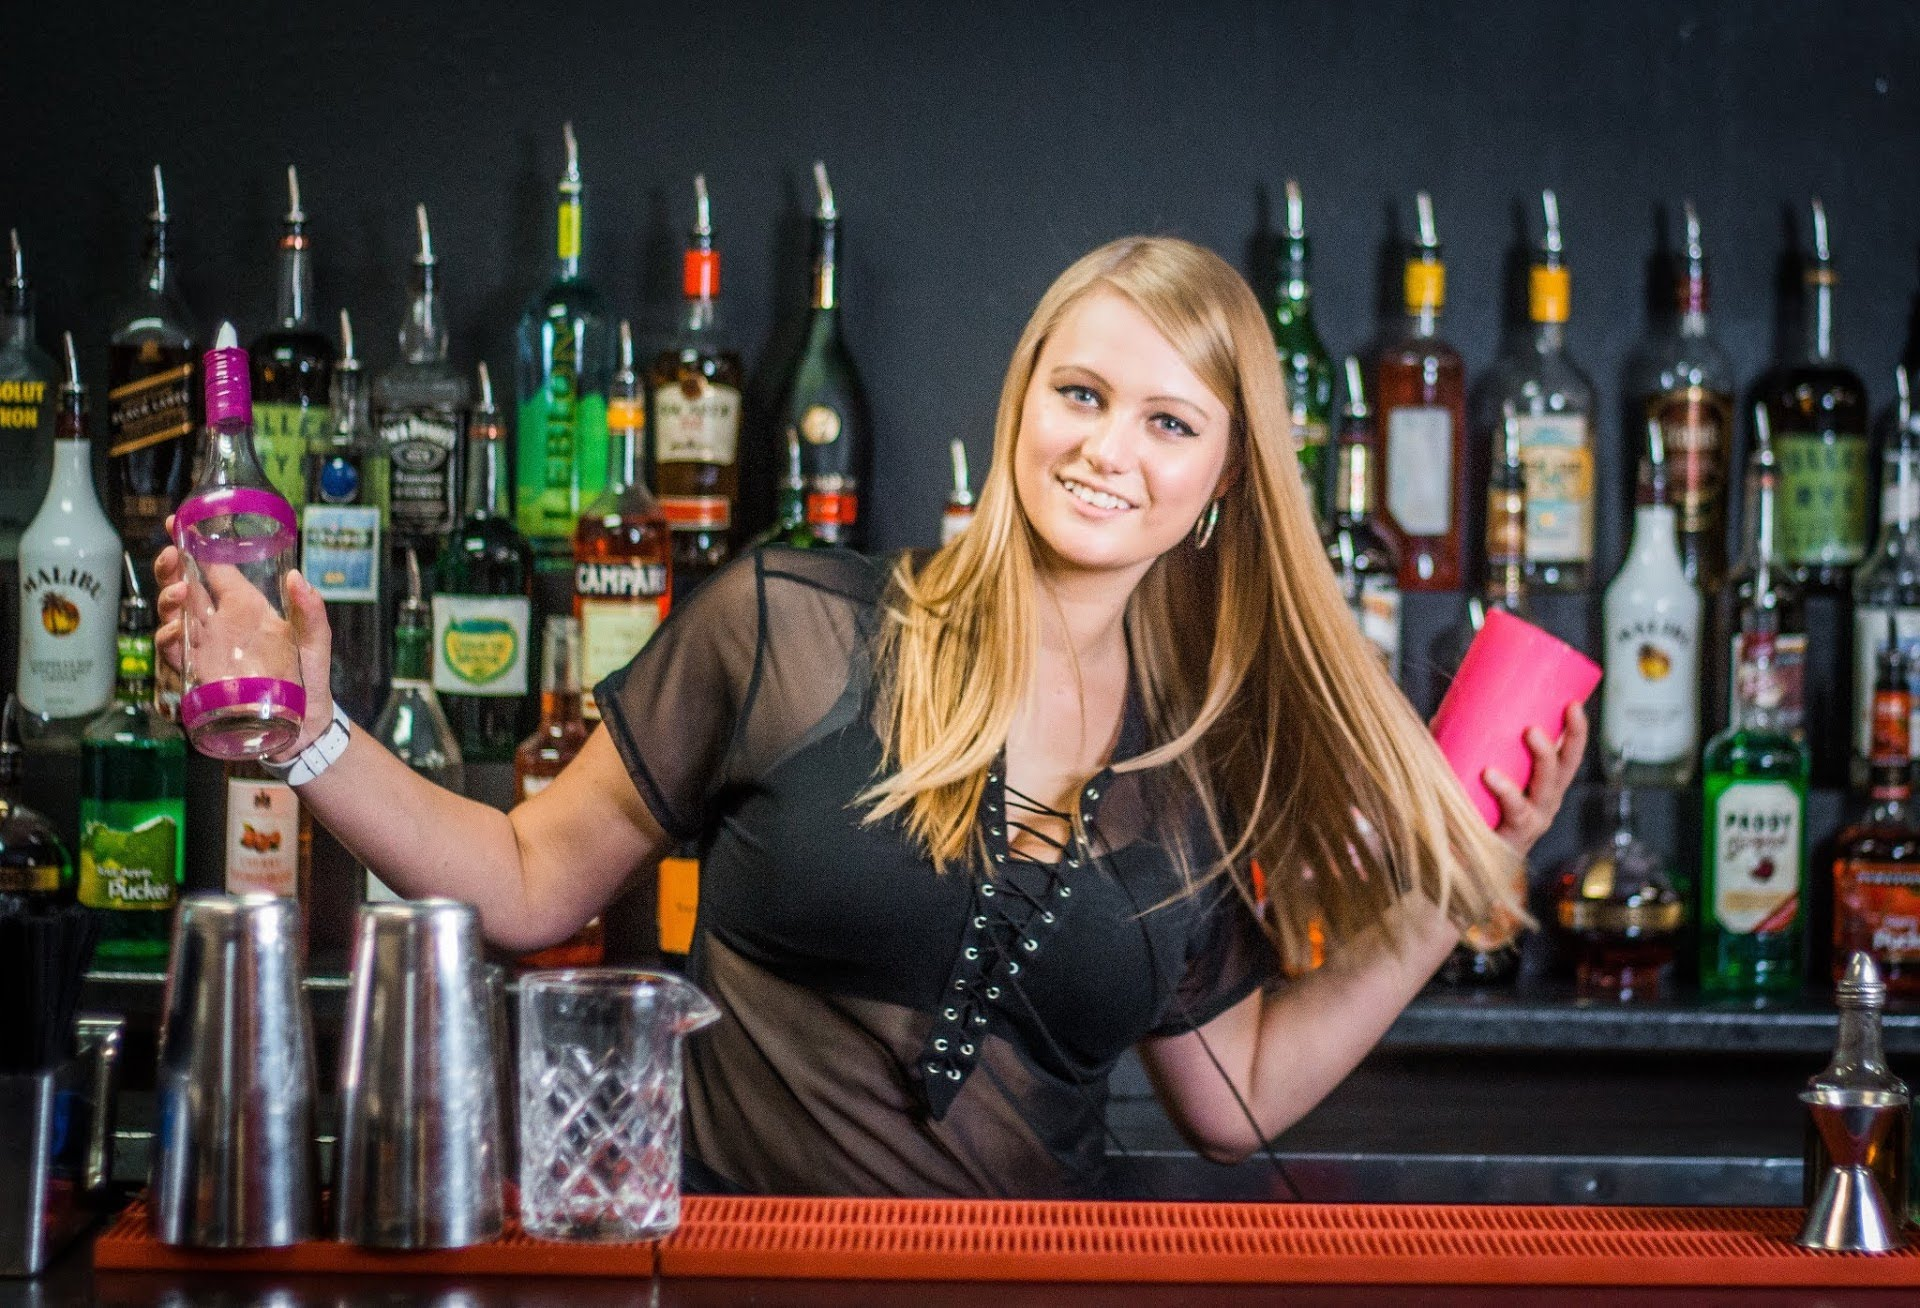 learn to flair with lindsay palumbo flair bartending classes